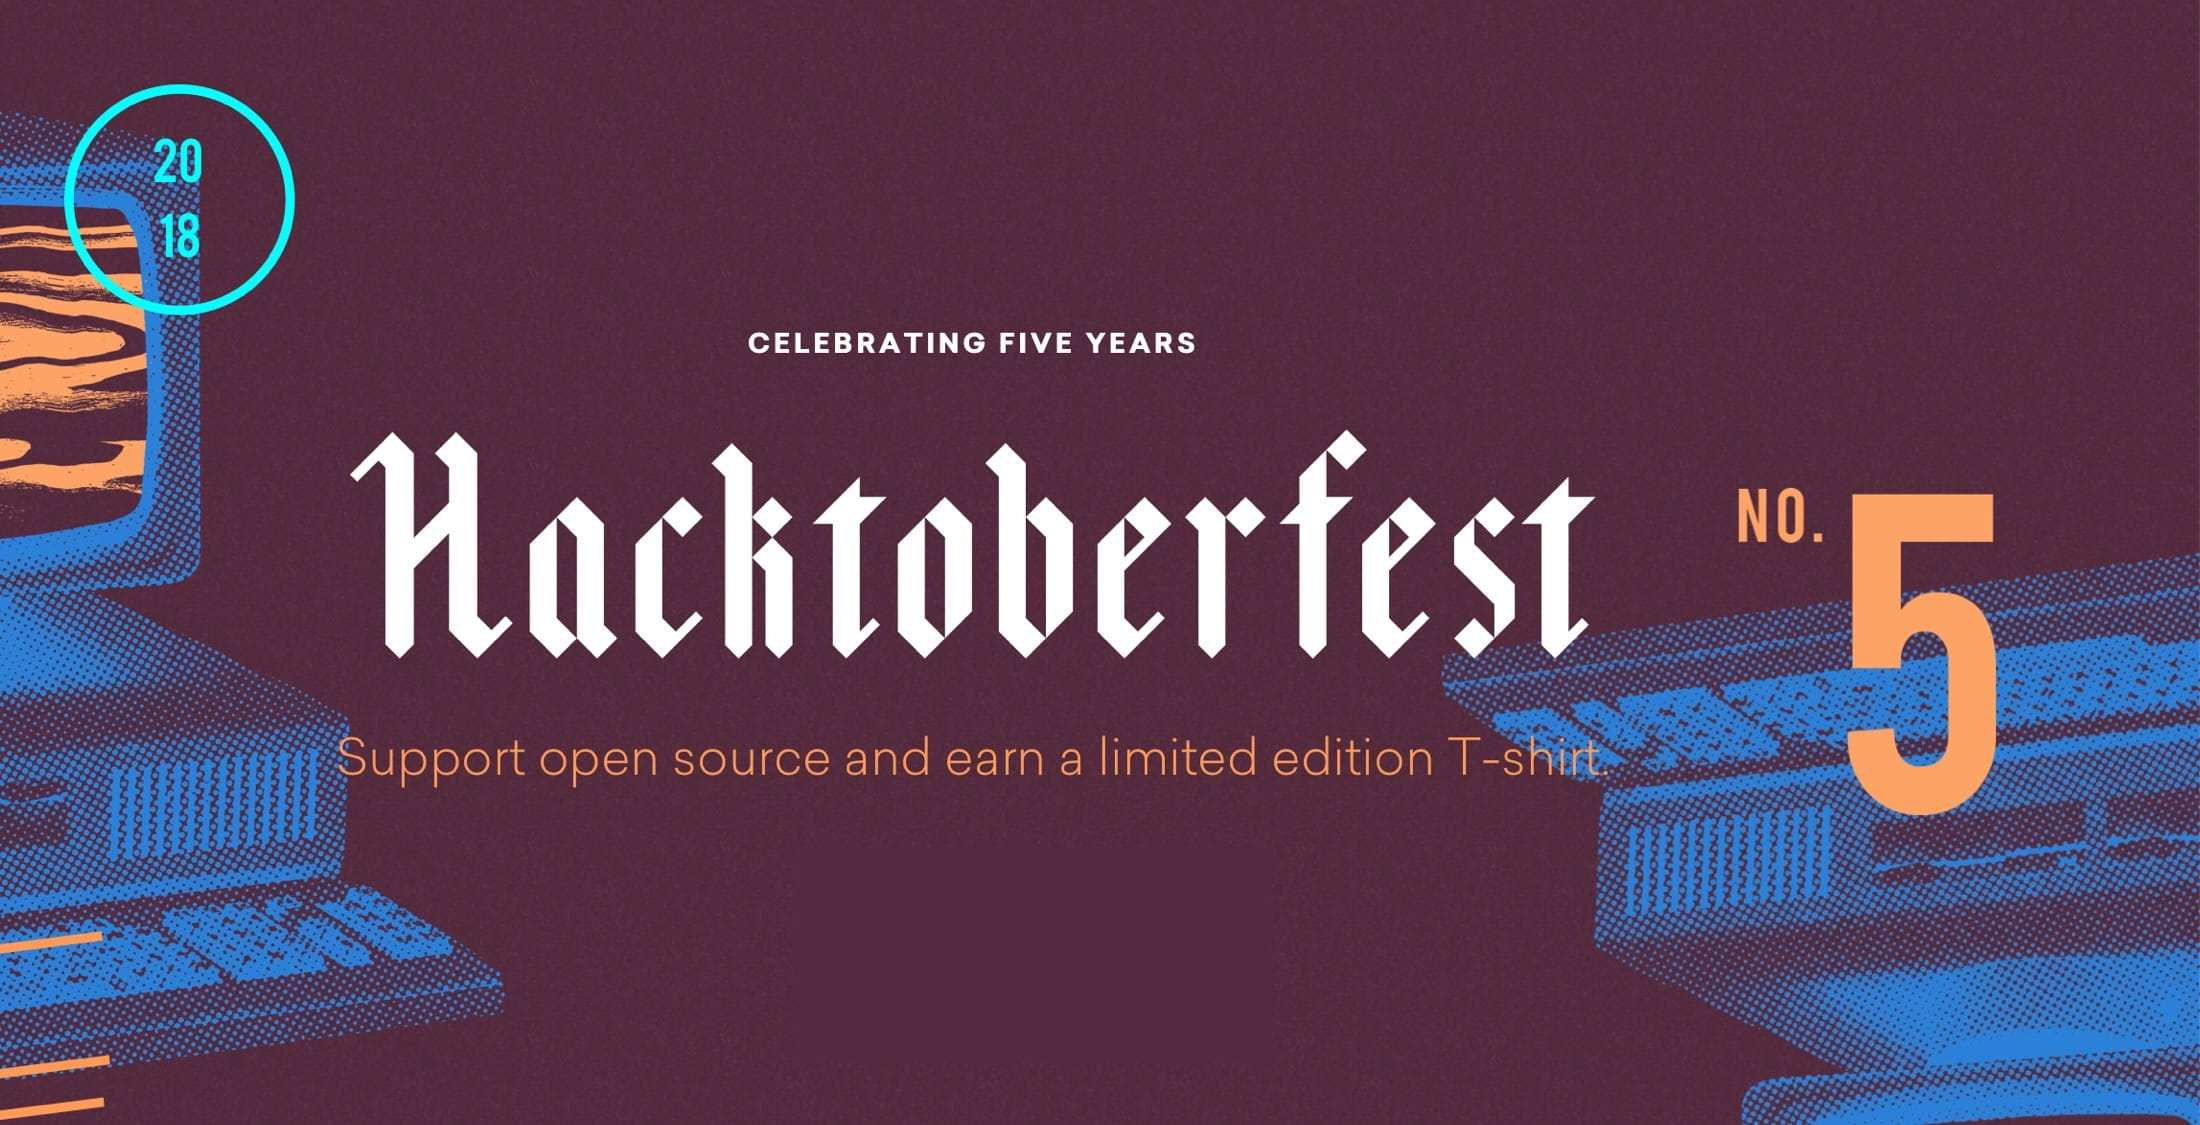 Hacktoberfest 2018 - Celebrating 5 Years!